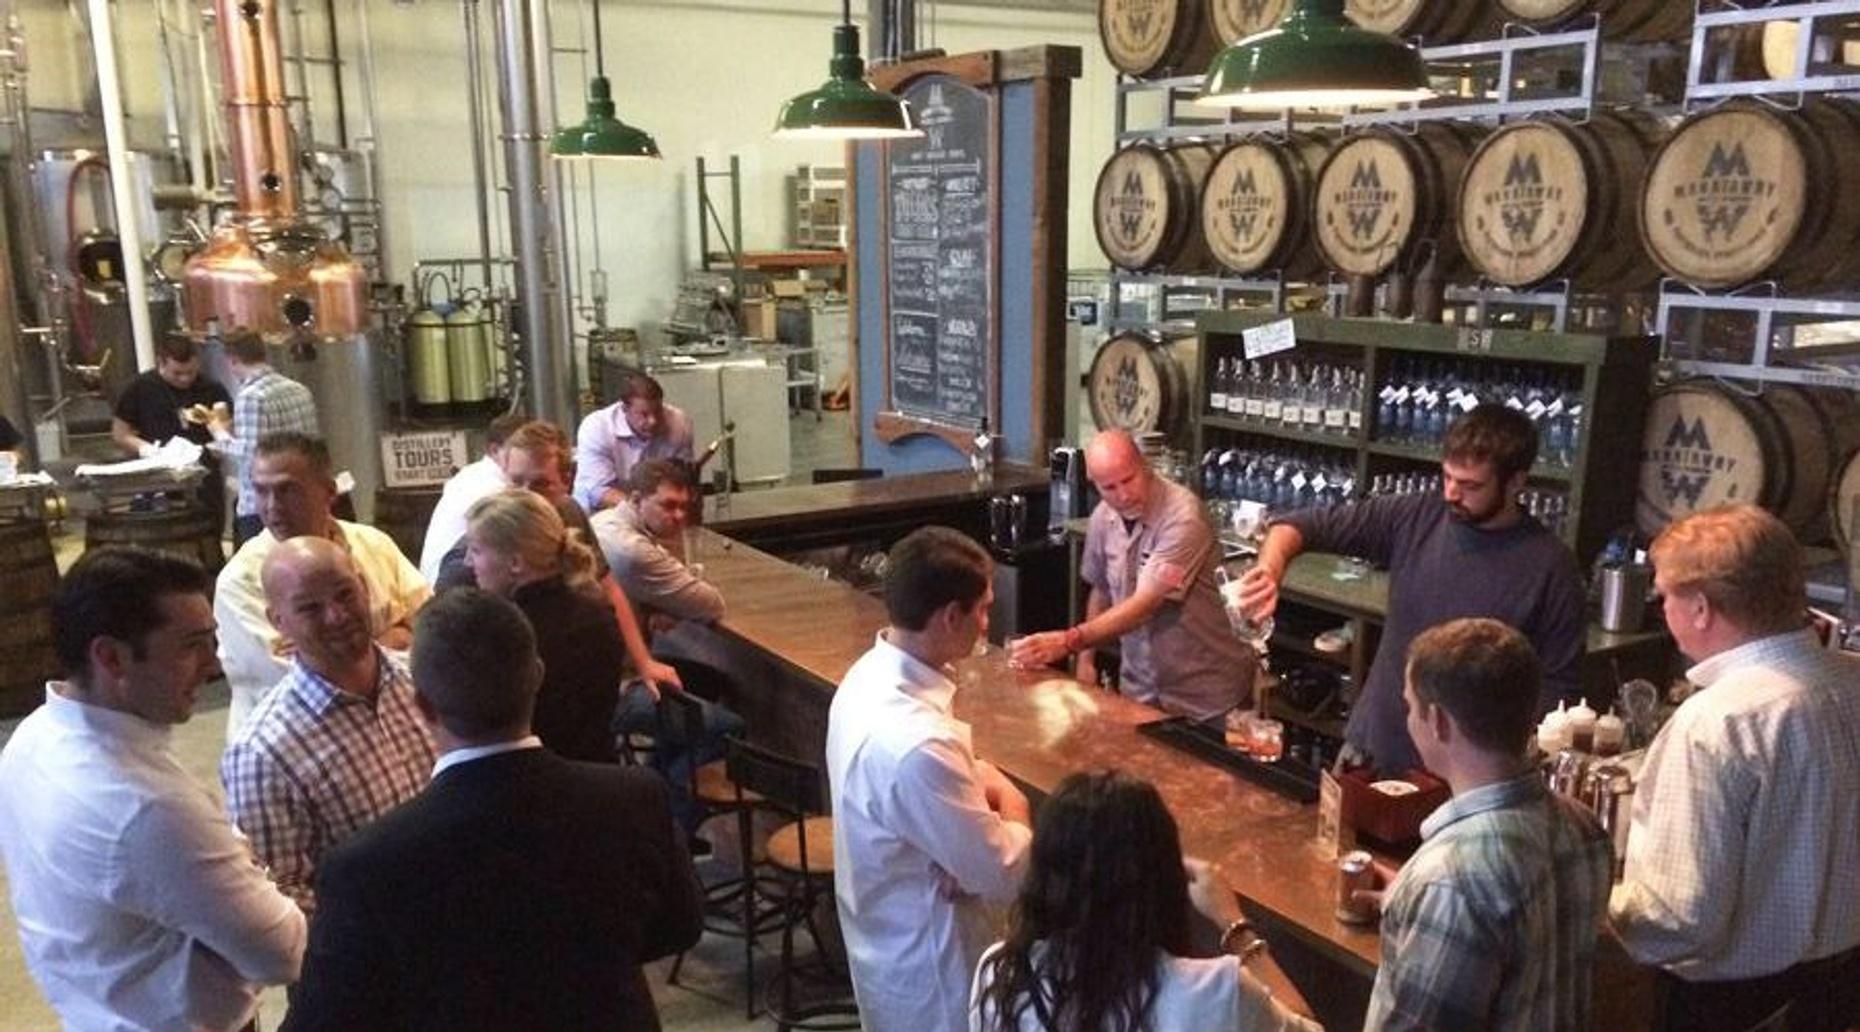 Distillery Tour in Pottstown